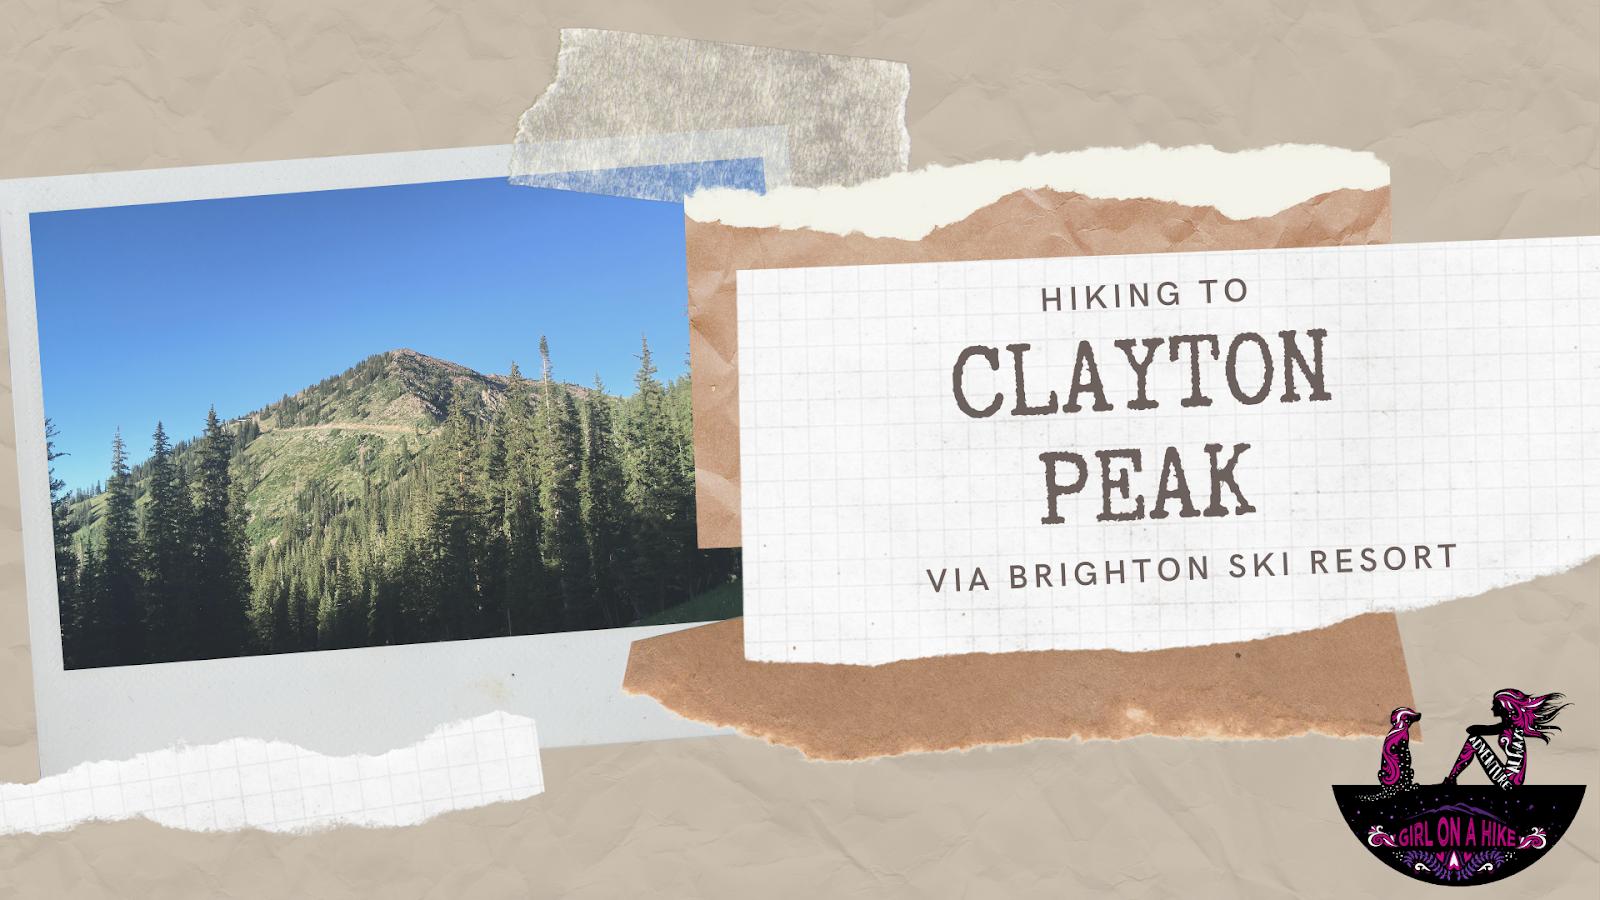 Hiking to Clayton Peak via Brighton Ski Resort